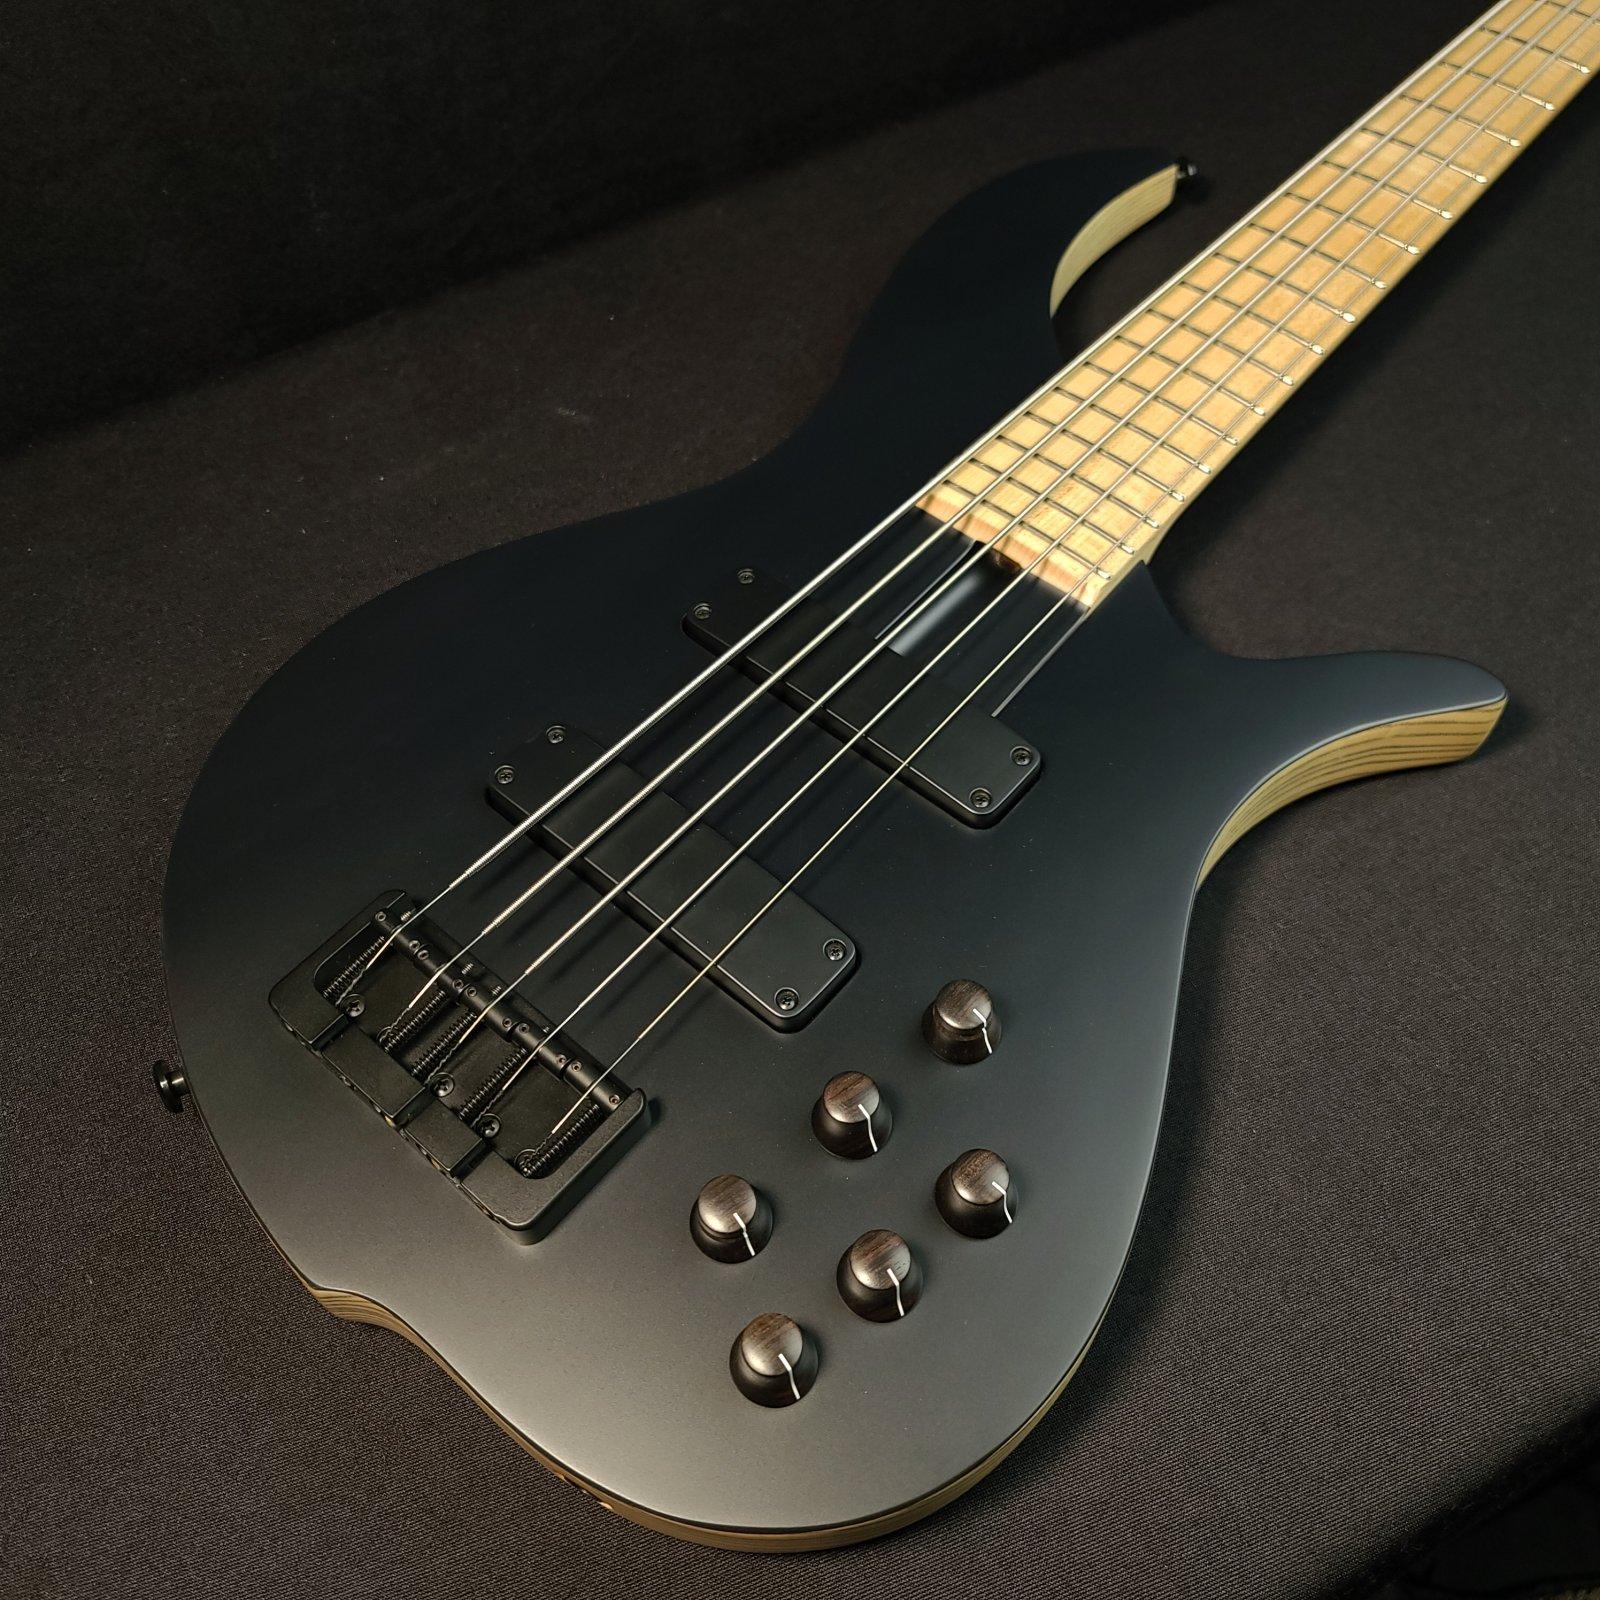 F Bass BN5 5 String Bass Flat Top 2-Piece Ash Body w/ Gig Bag